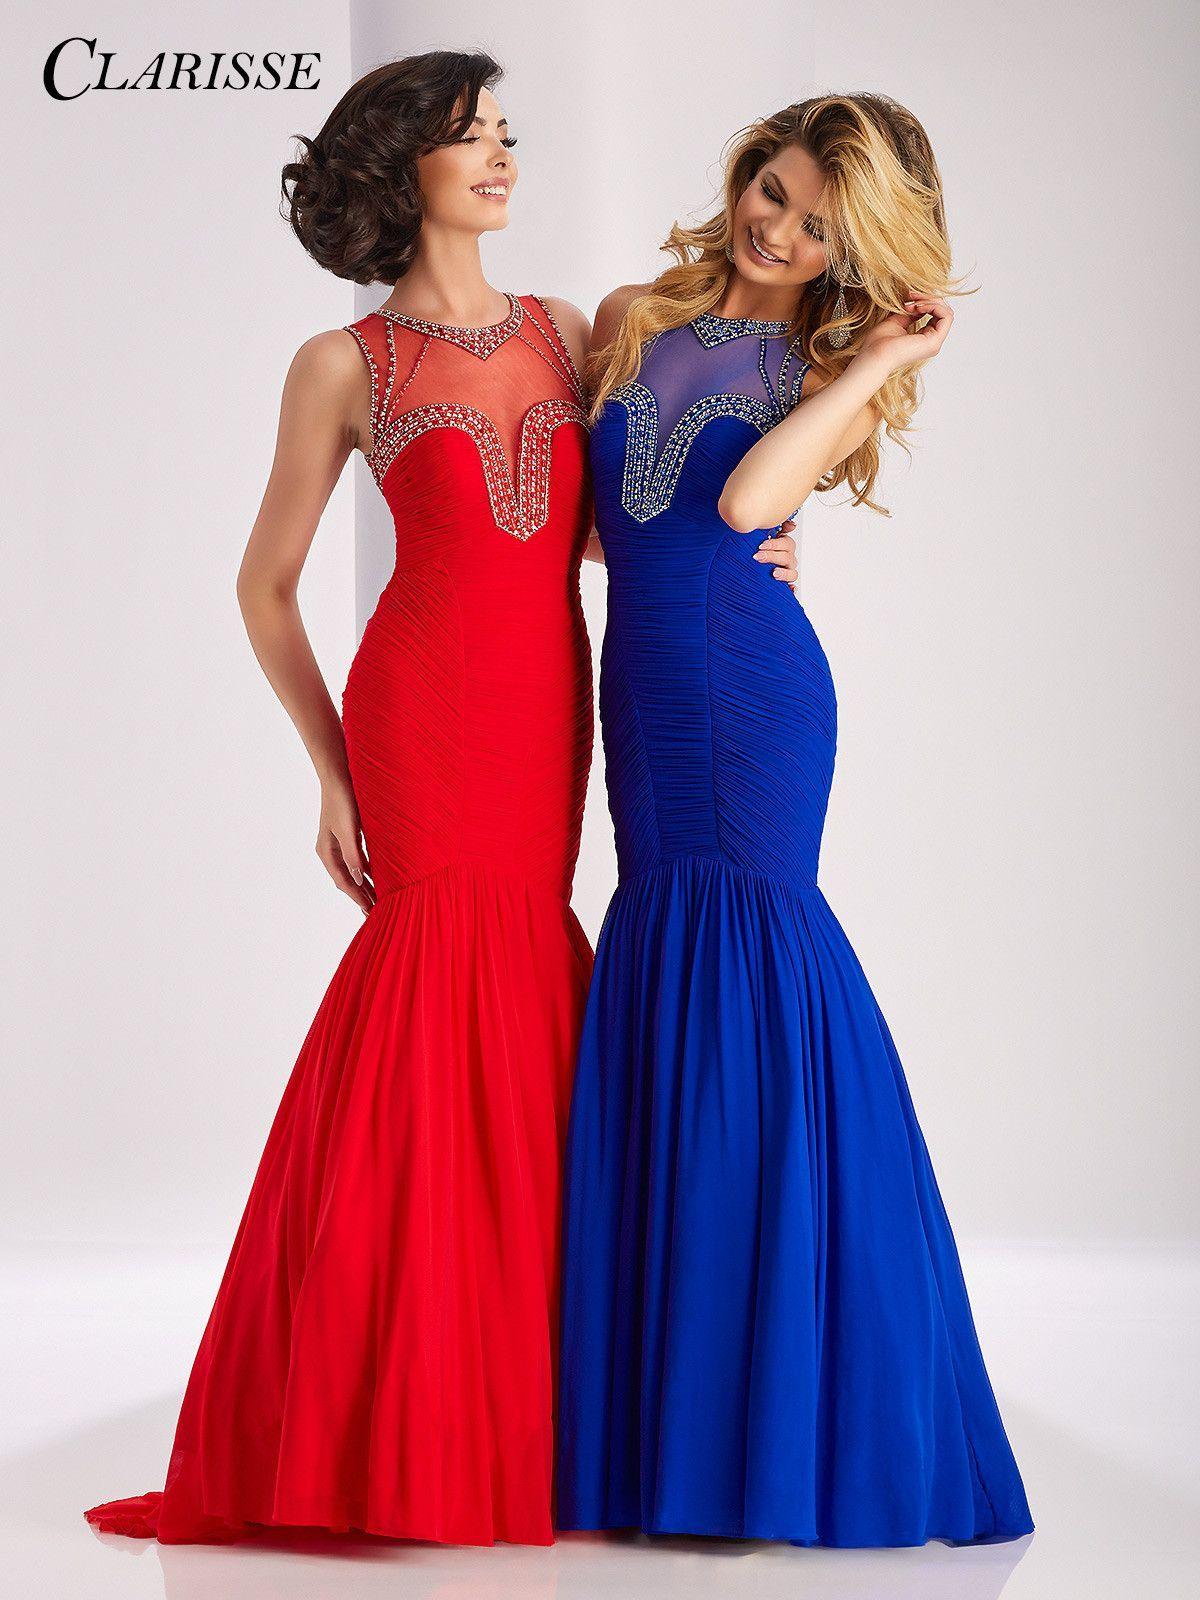 Clarisse prom royal high neckline prom dress pinterest prom